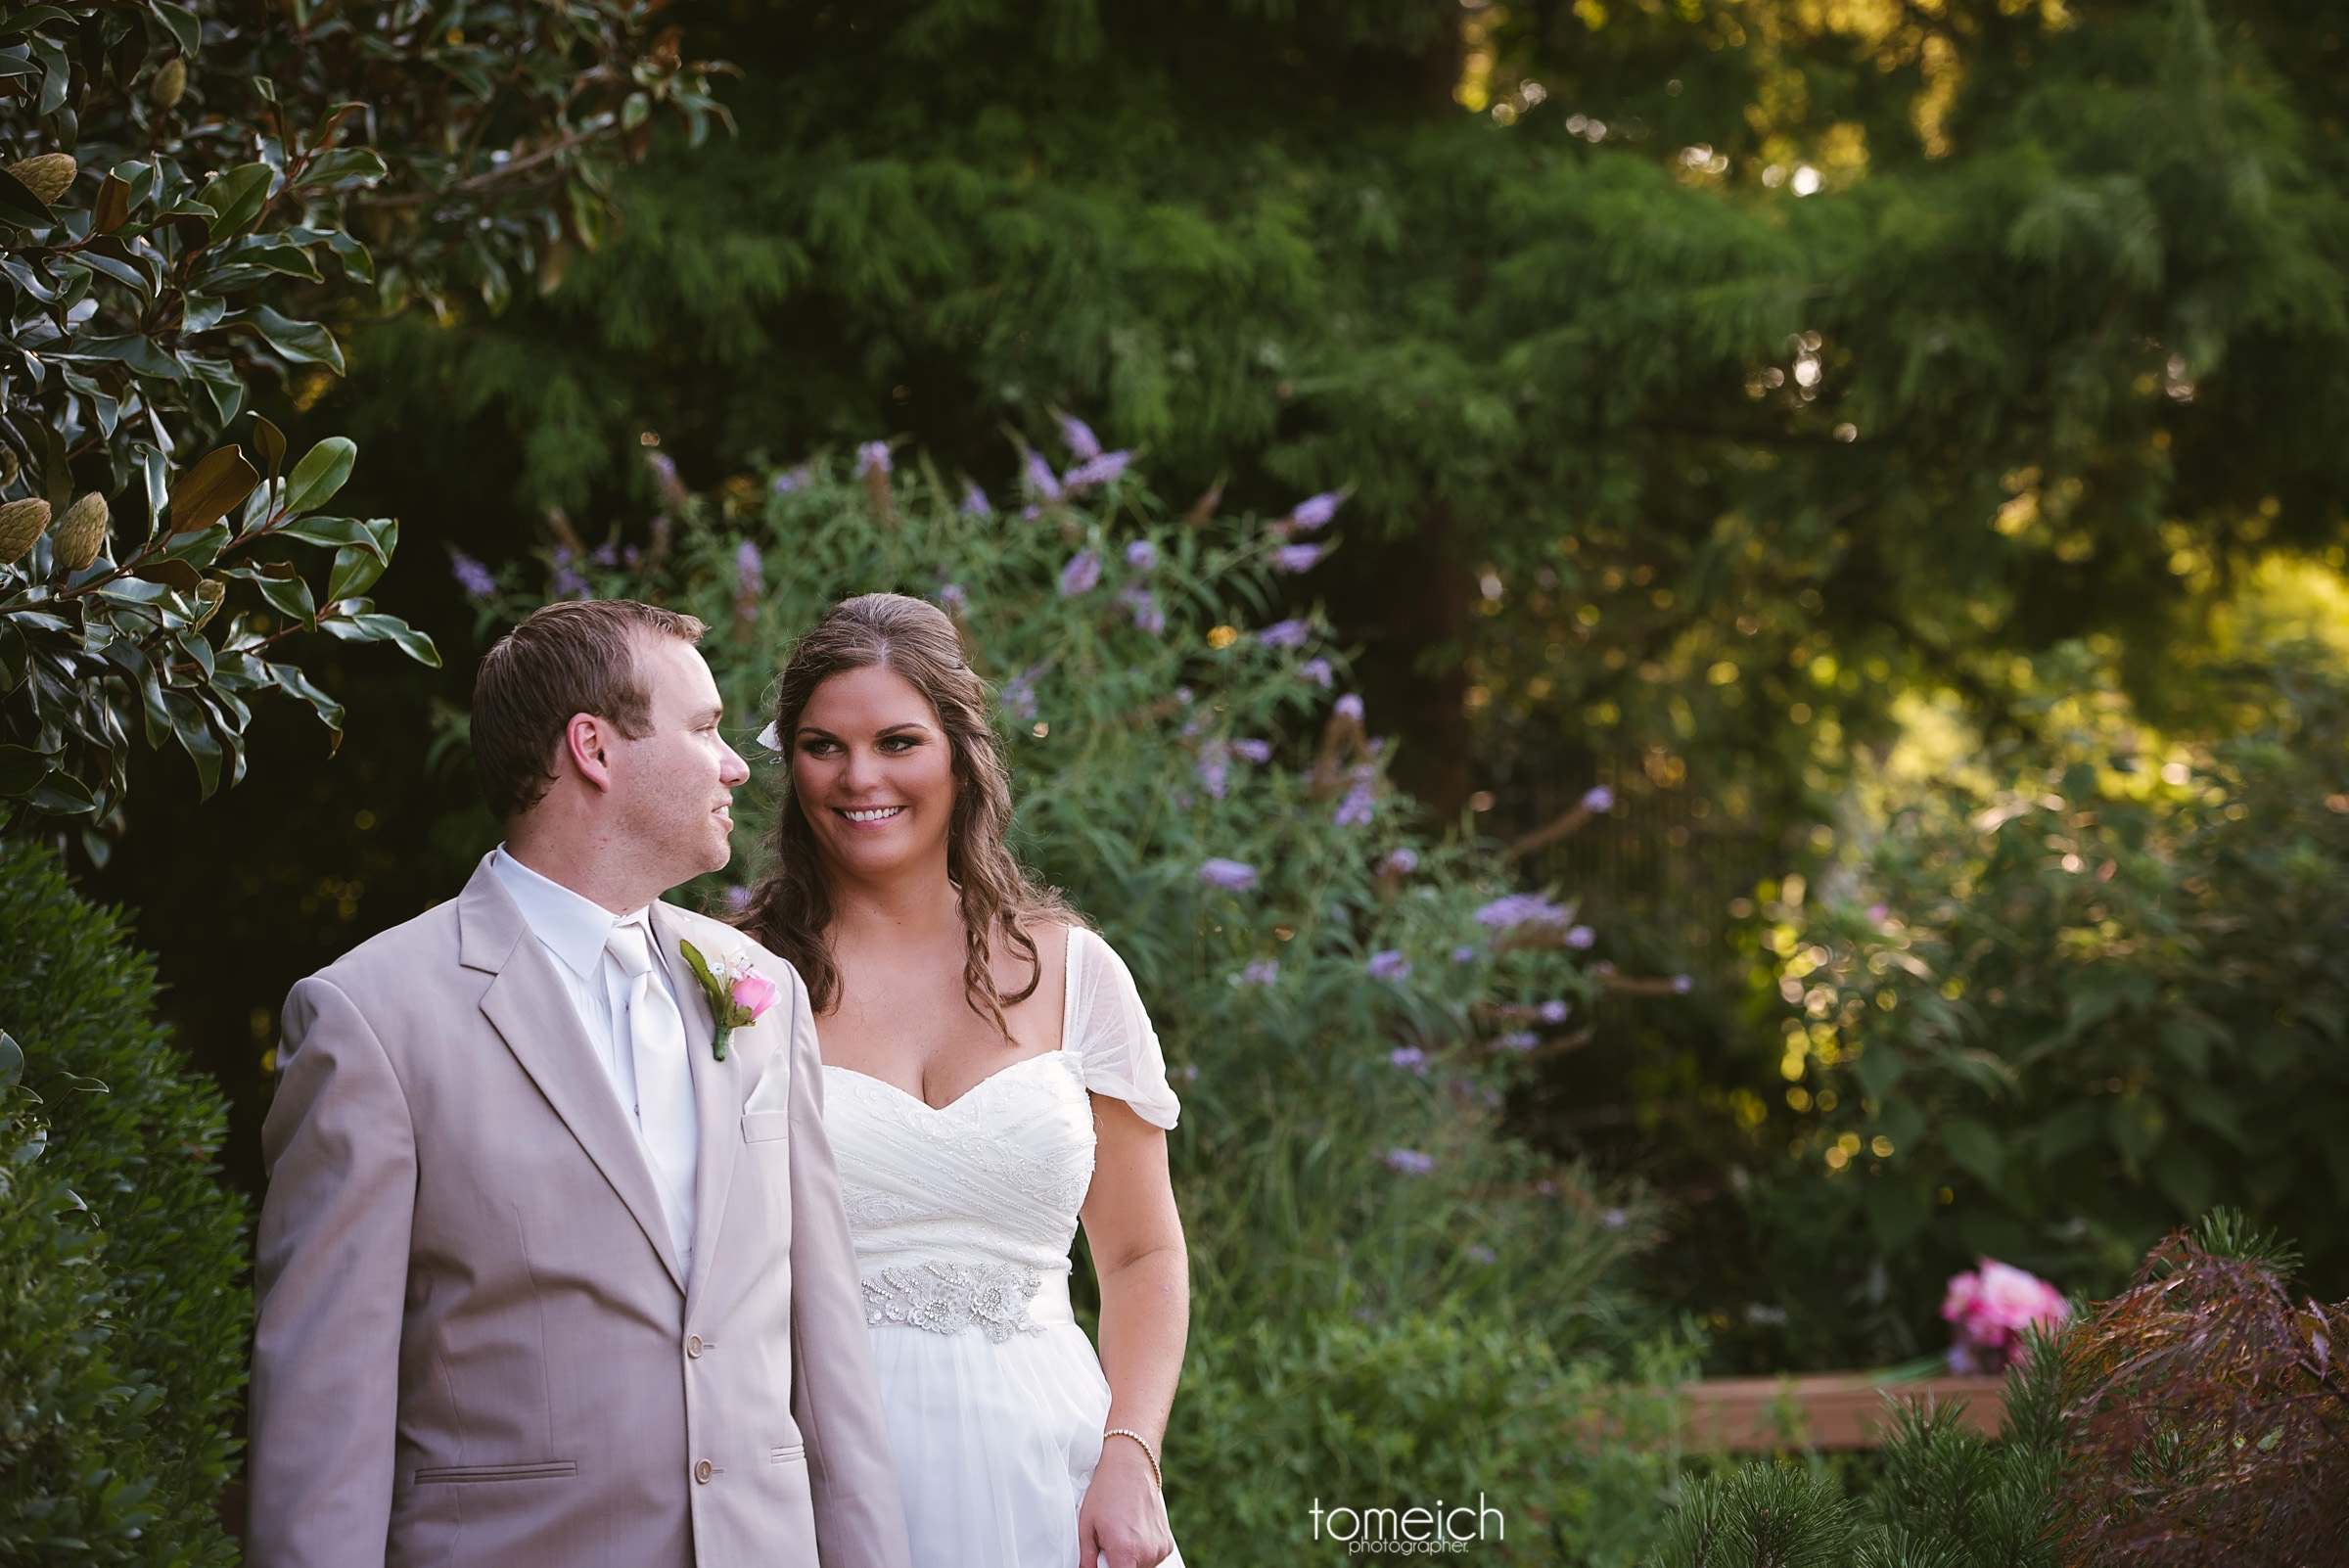 butterfly house wedding chesterfield-29.jpg